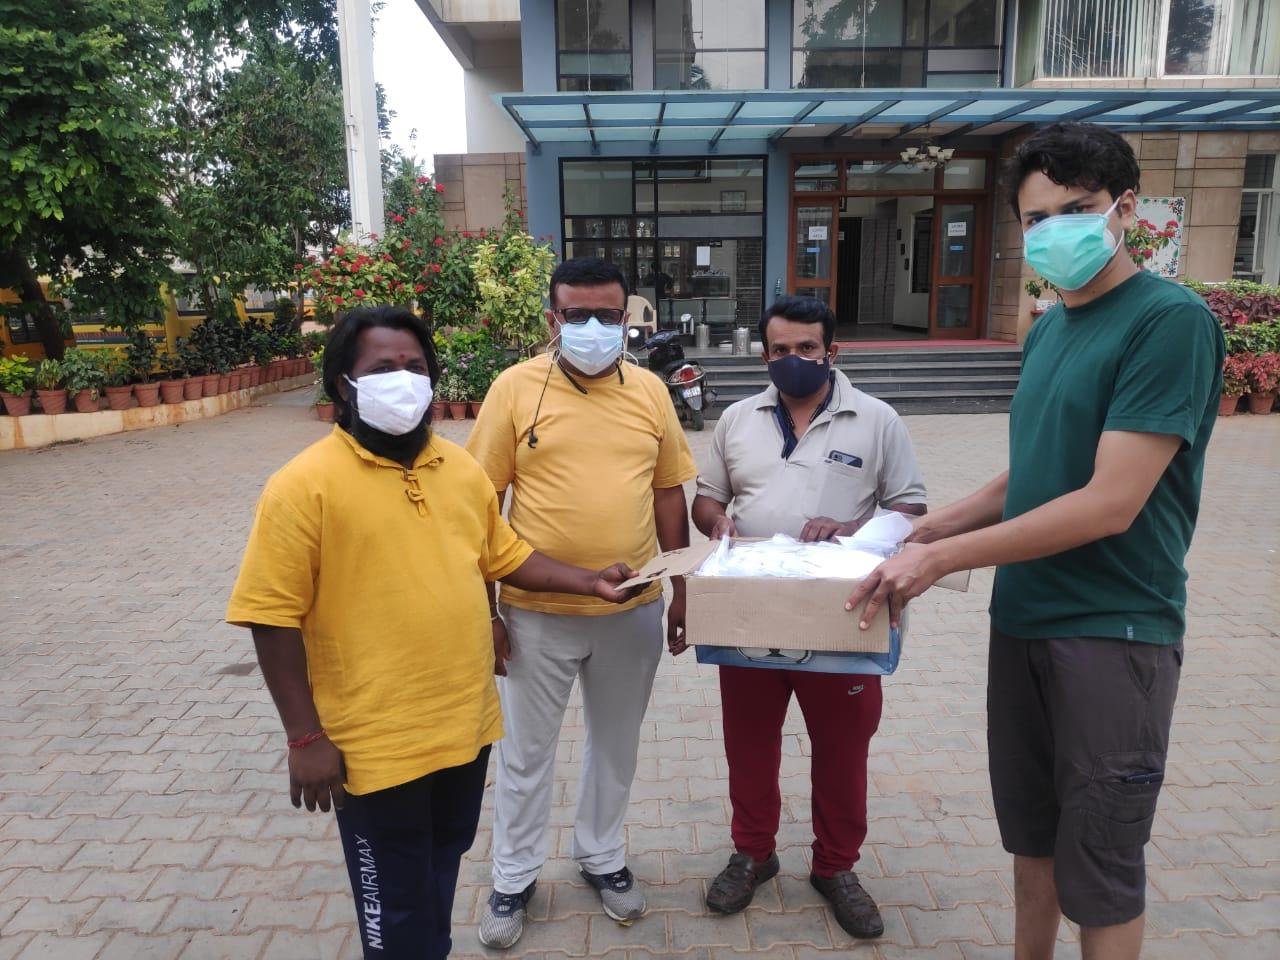 Distribution at Ramamurthy Nagar